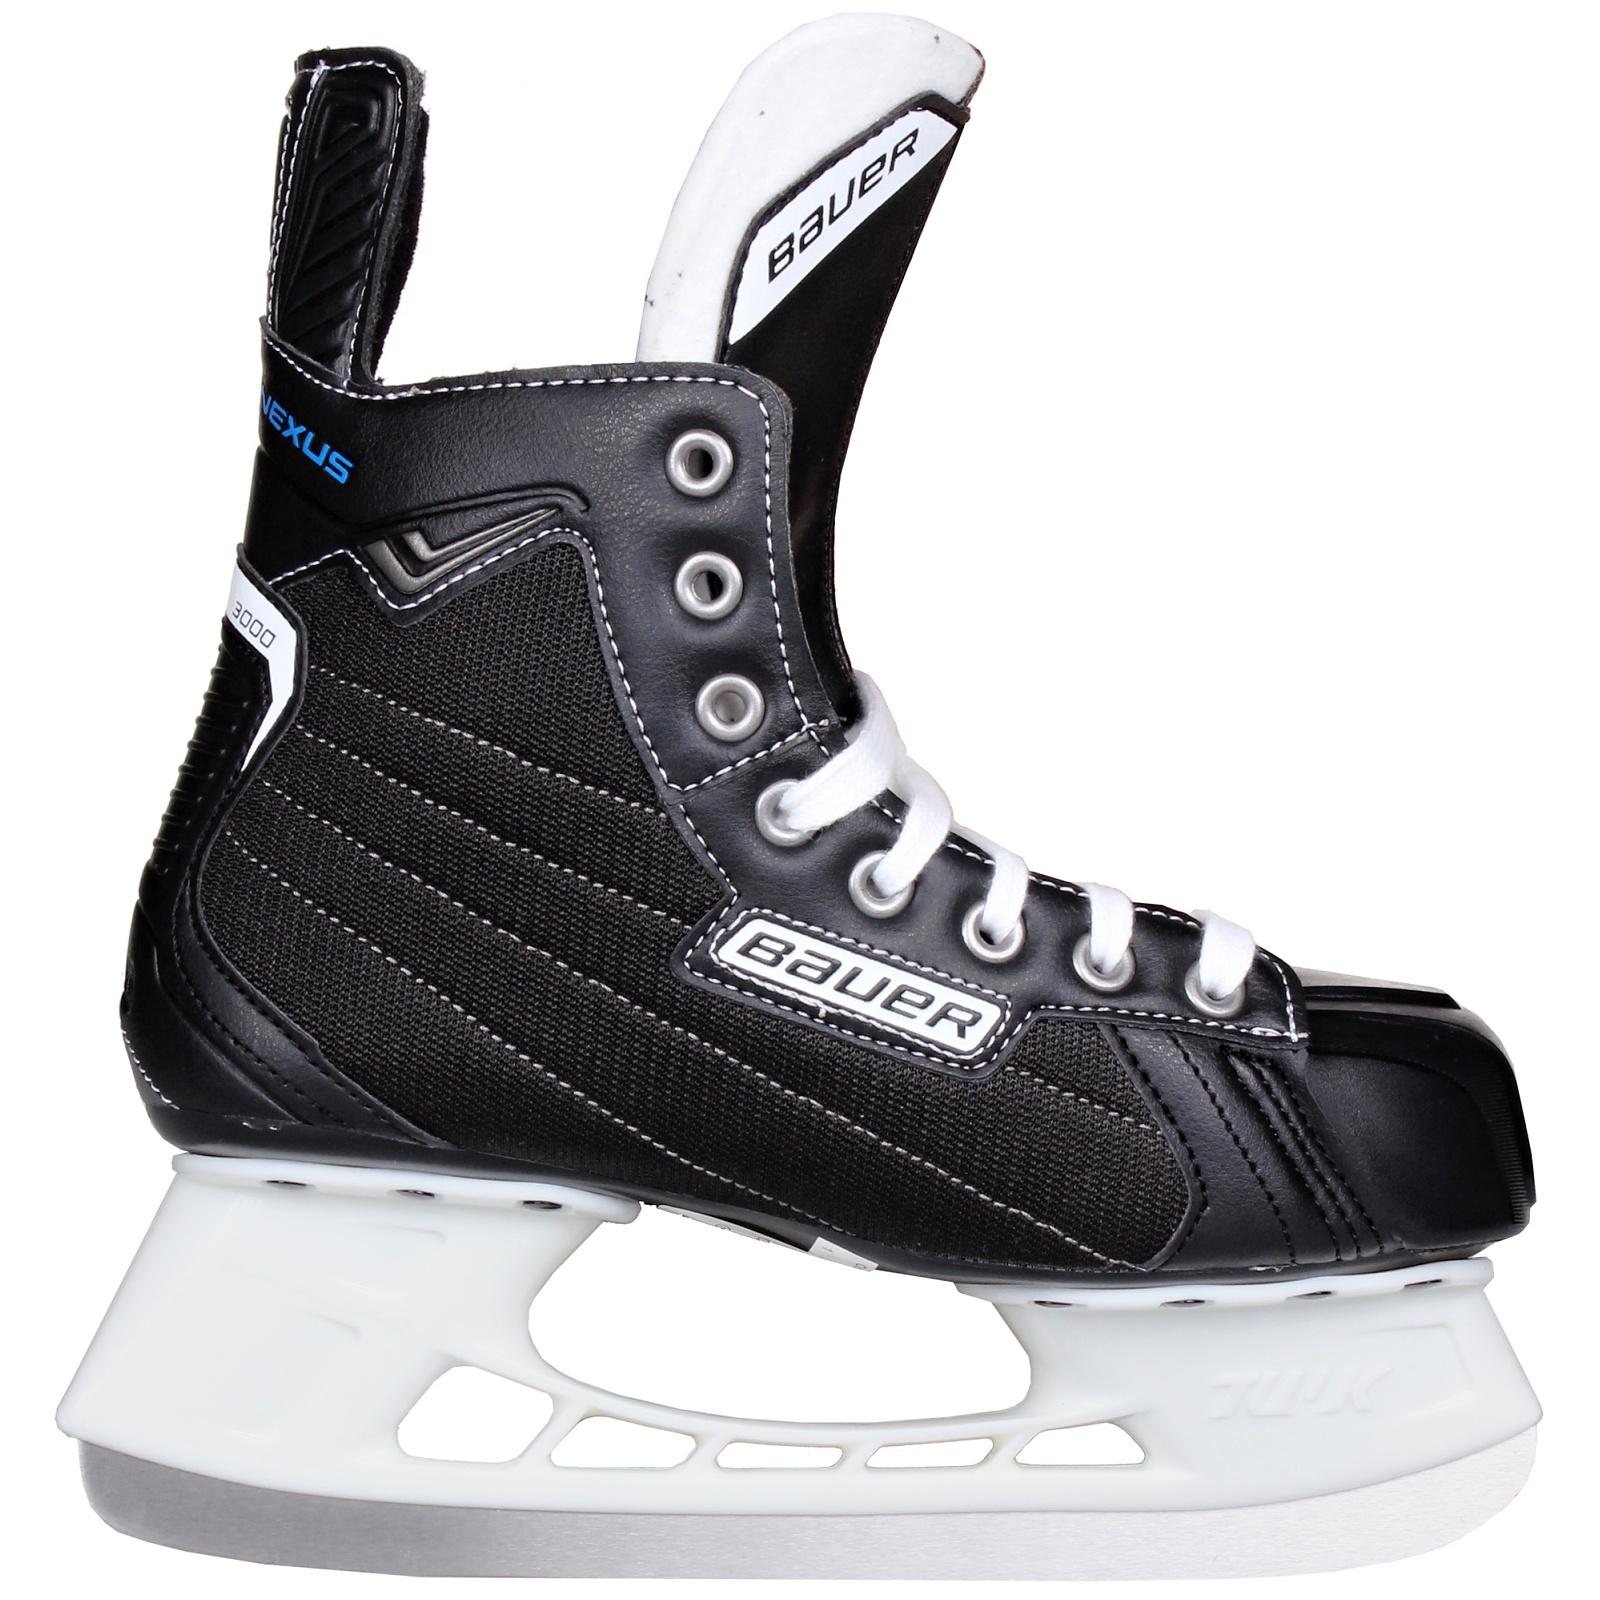 Hokejové brusle BAUER Nexus 3000 junior - vel. 37,5